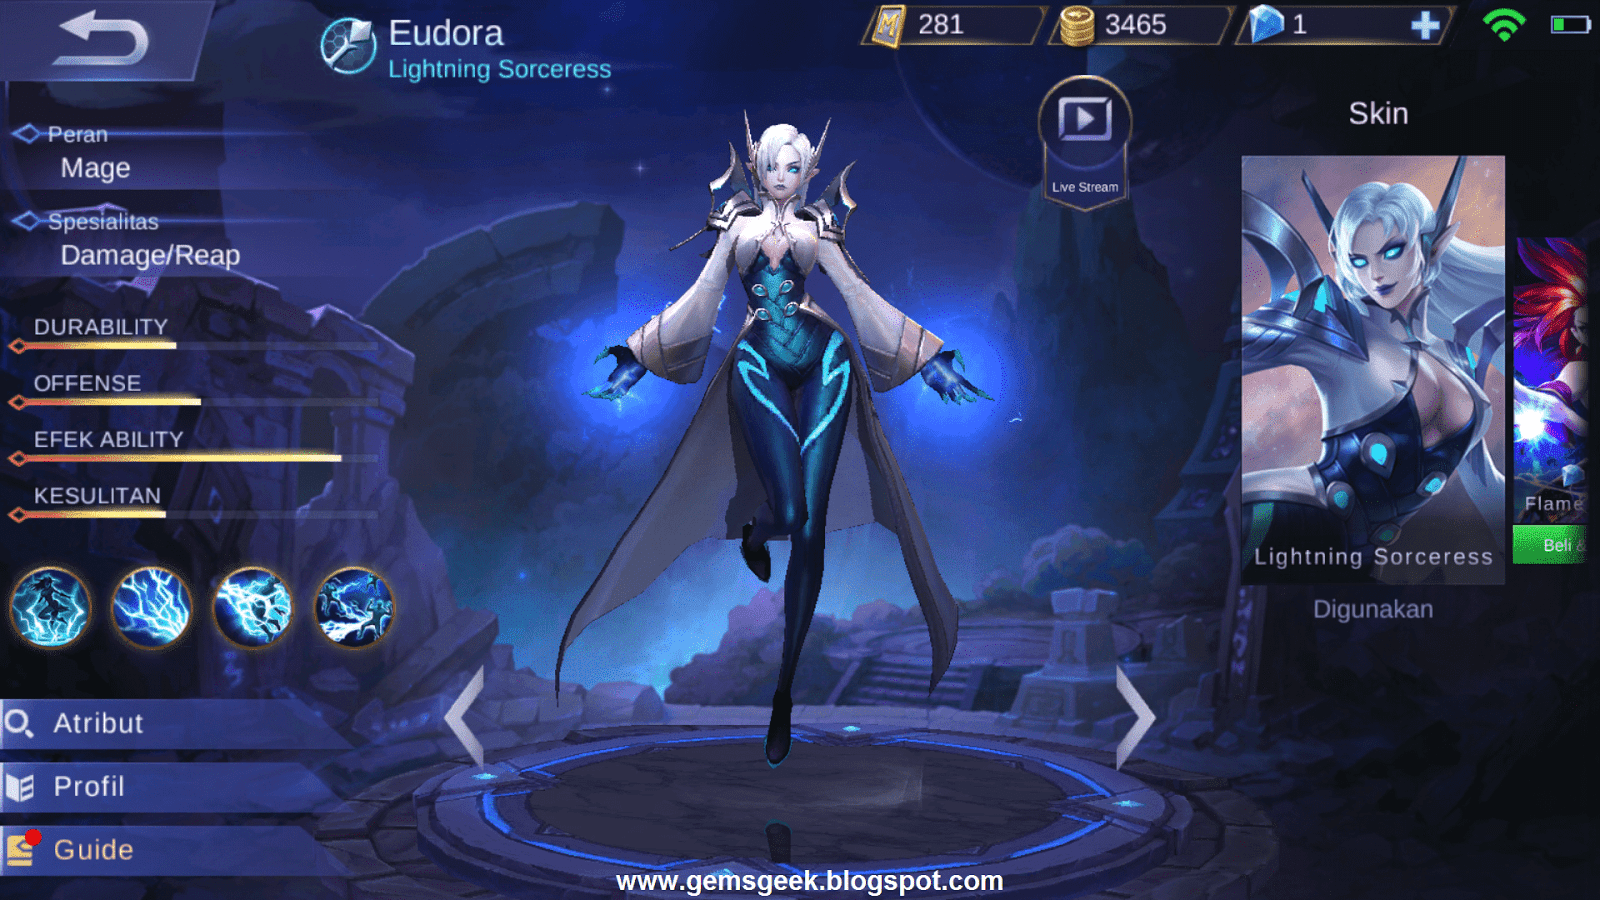 Eudora Mobile Legends Wizard With Electric Power GemsGeek